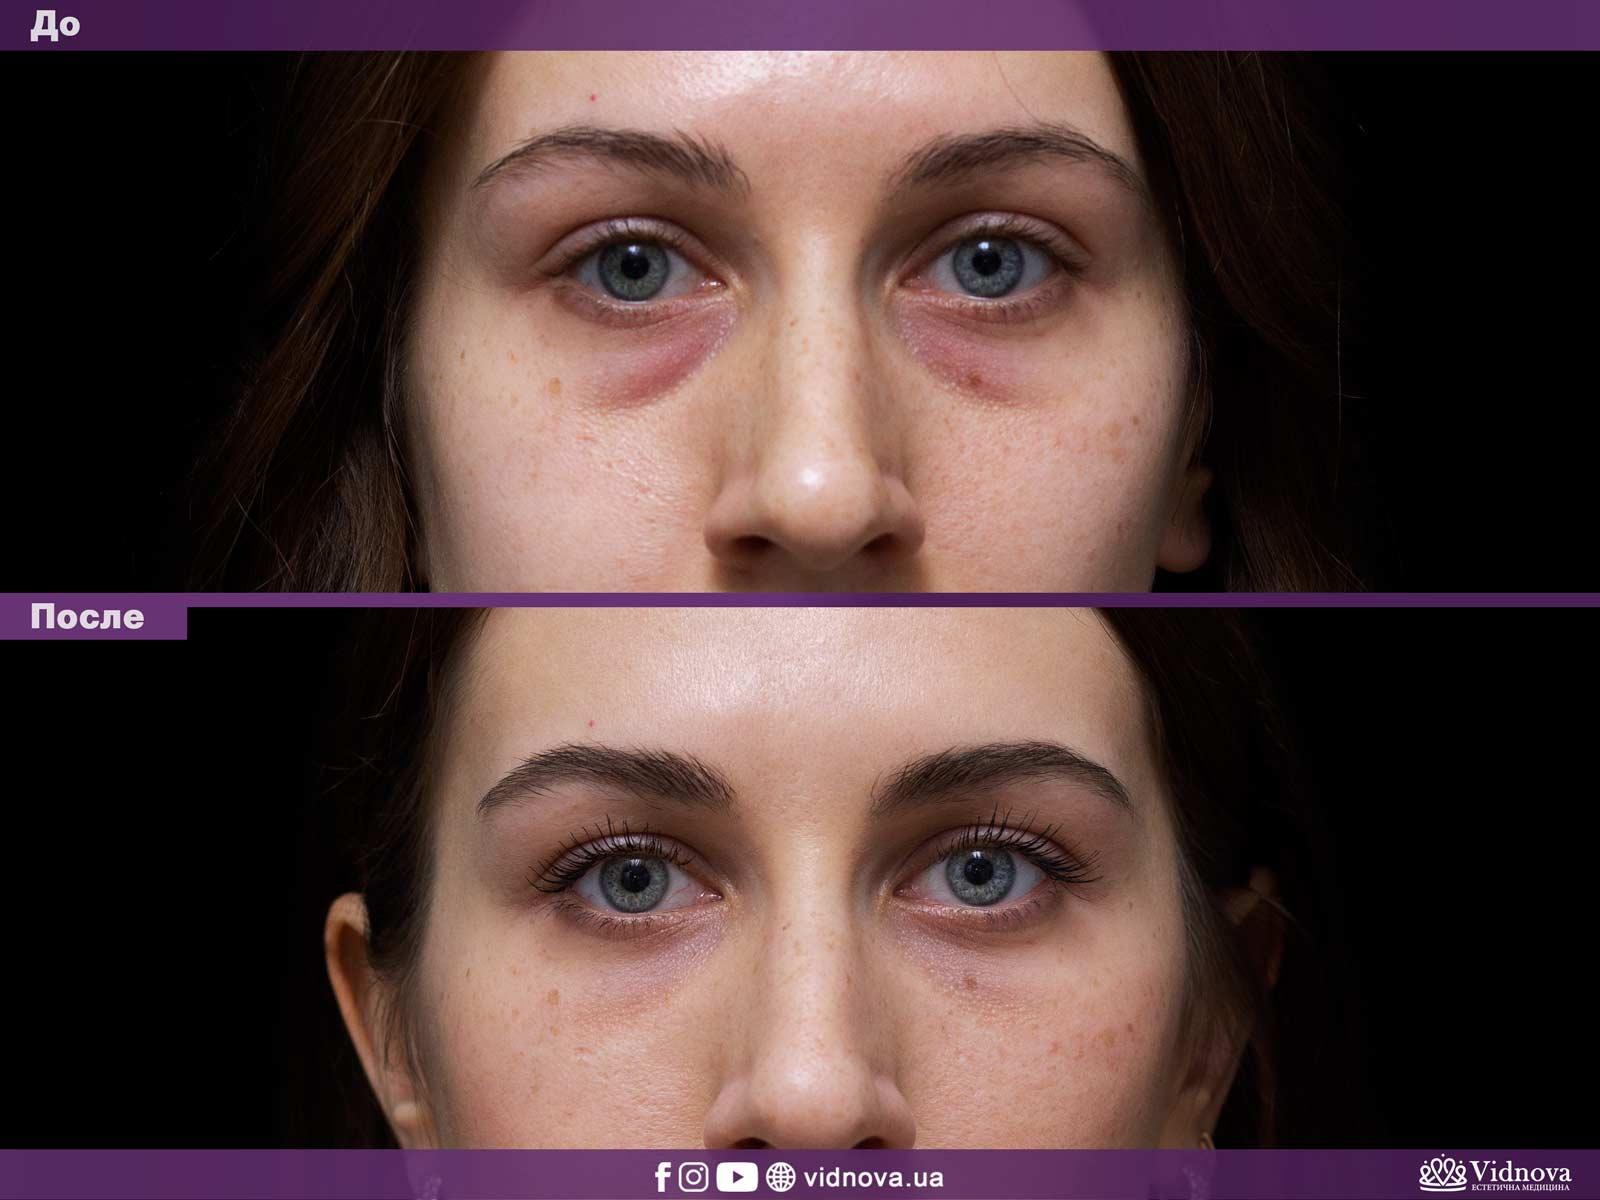 Блефаропластика: Фото До и После - Пример №8-1 - Клиника Vidnova